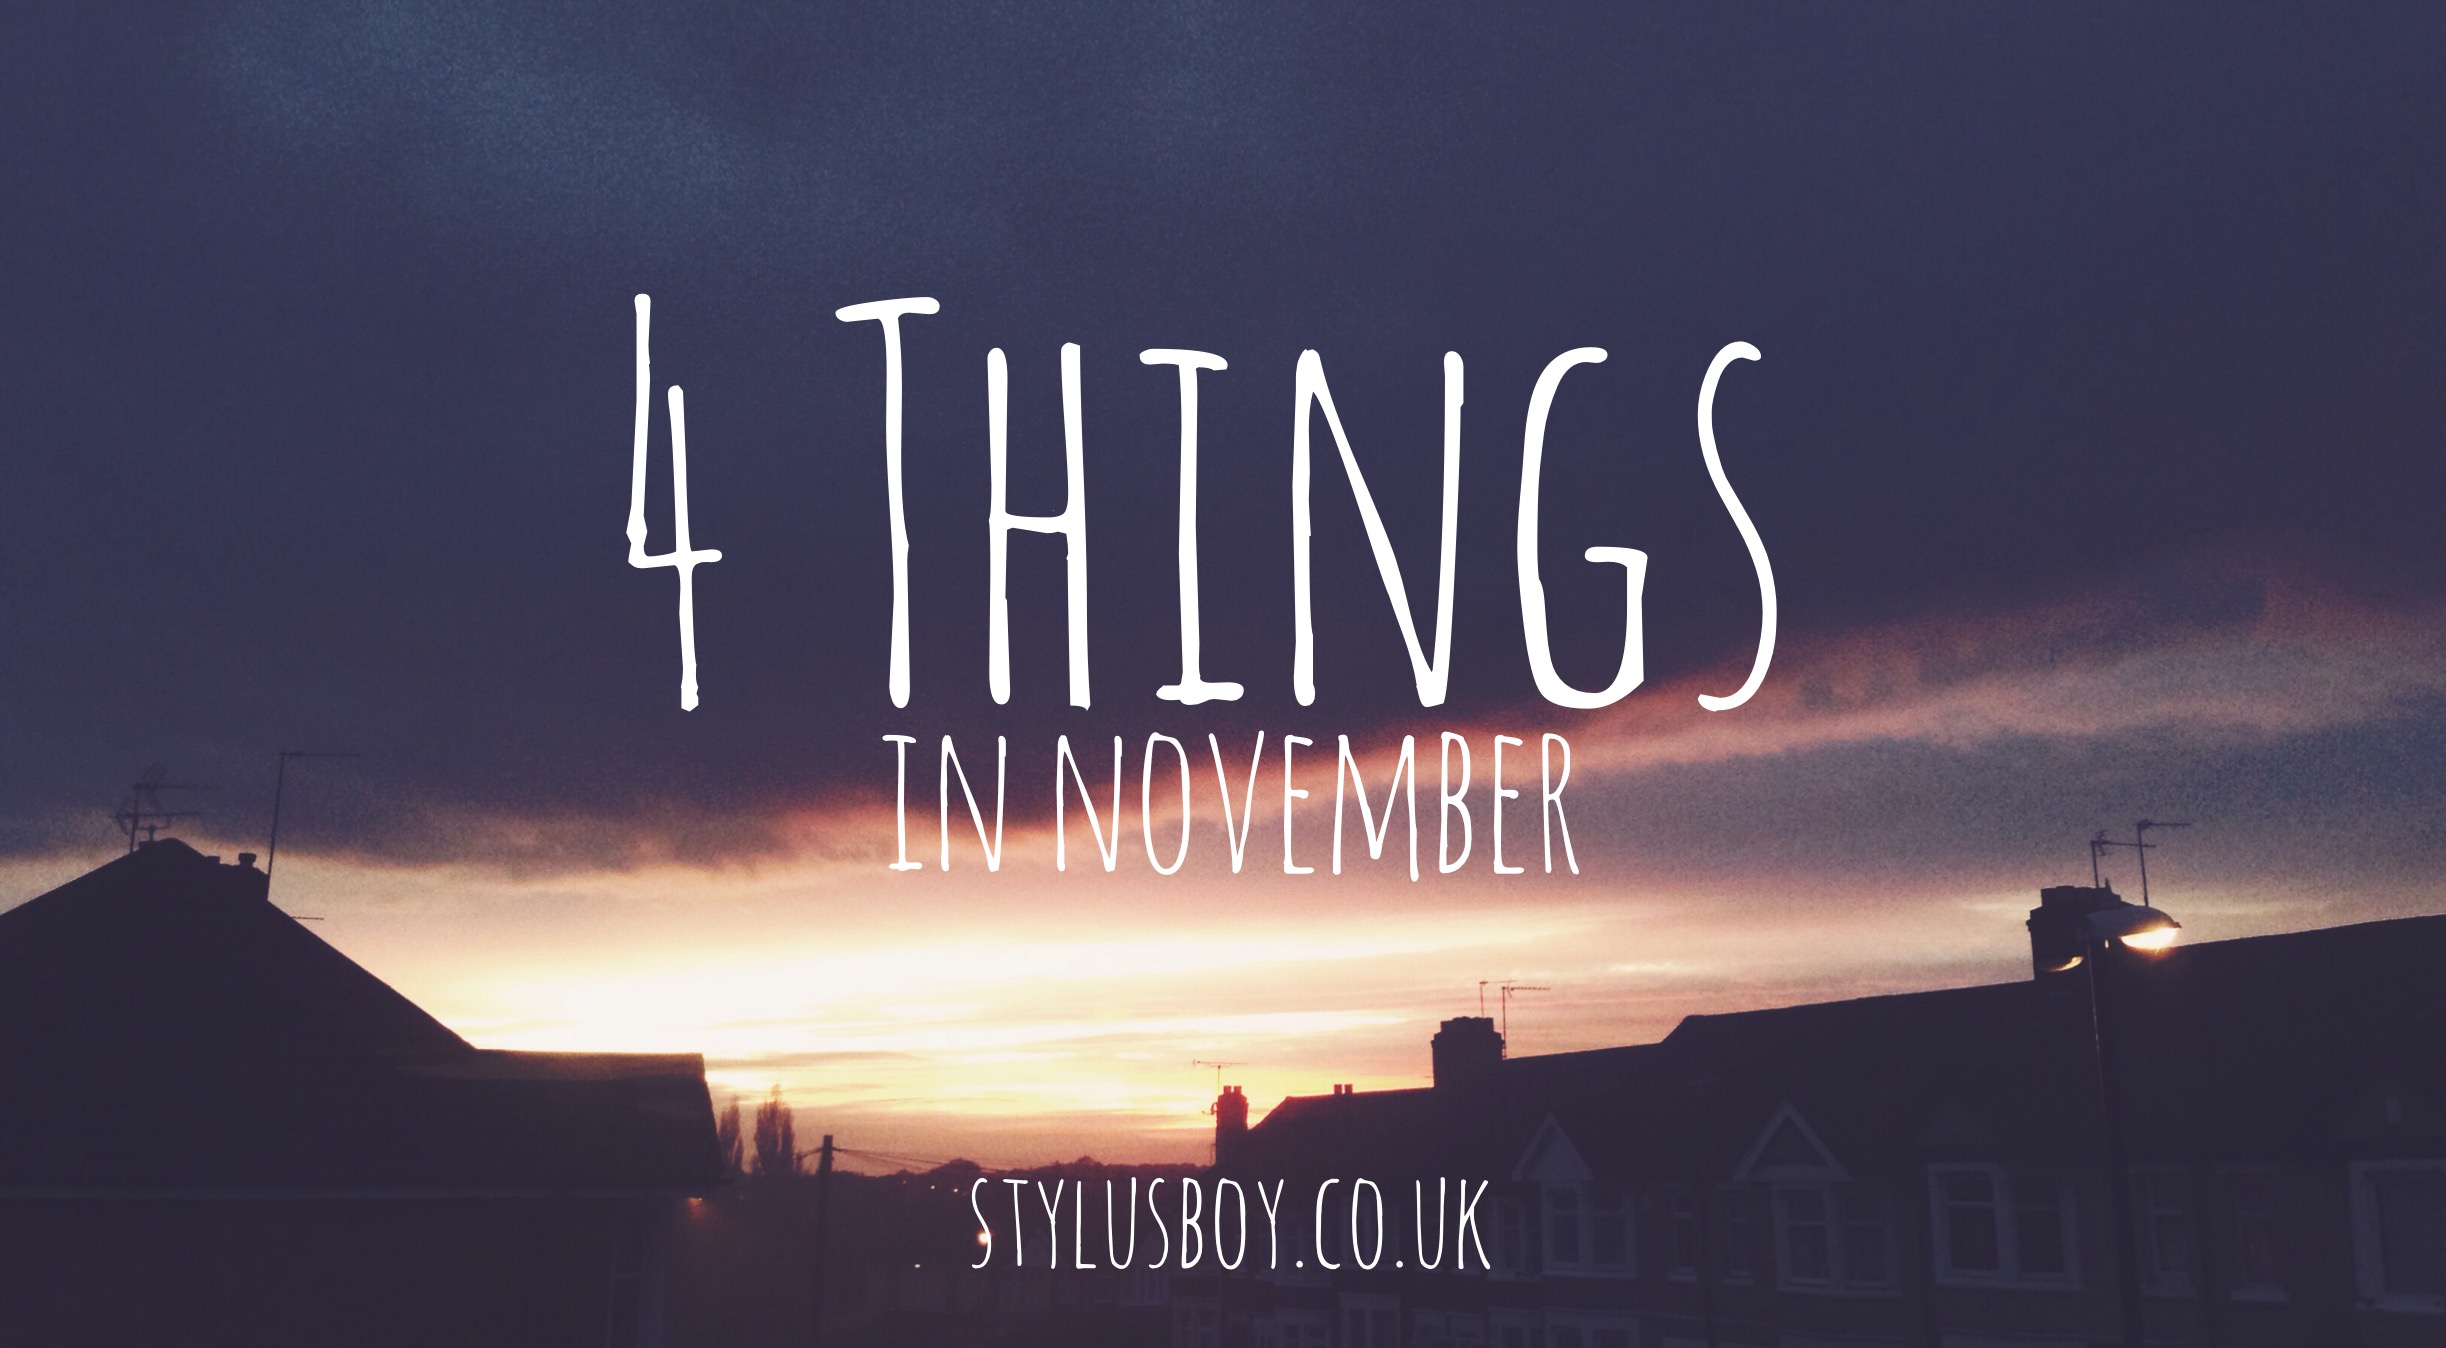 4-things-in-november-blog-header-stylusboy